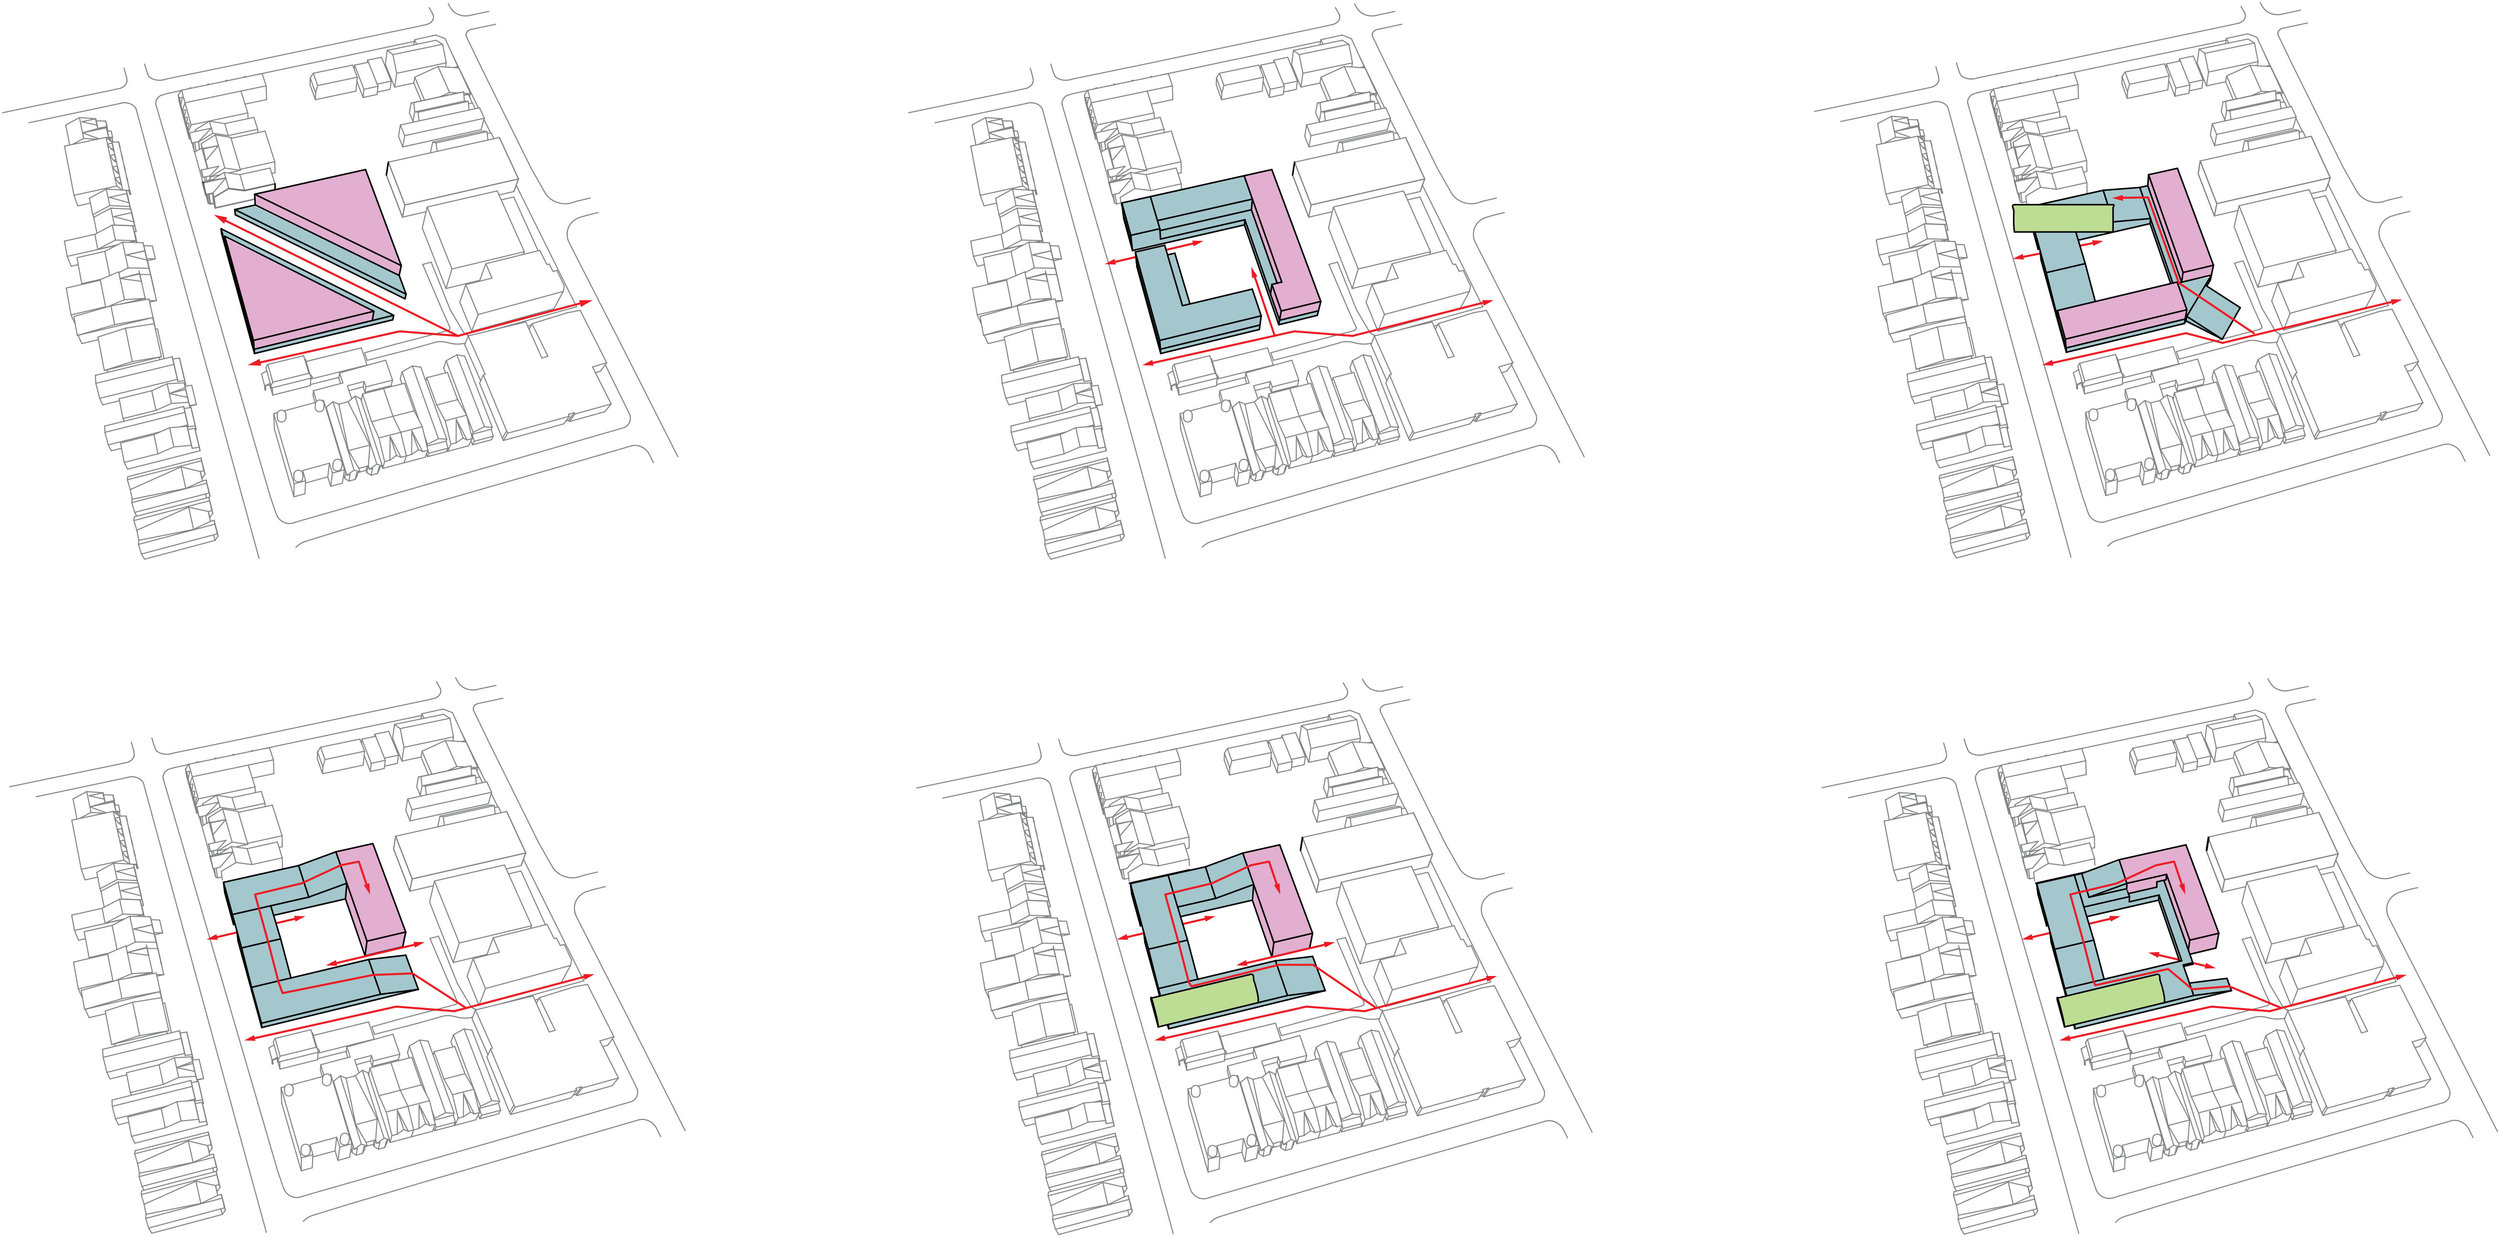 Site Plan Development